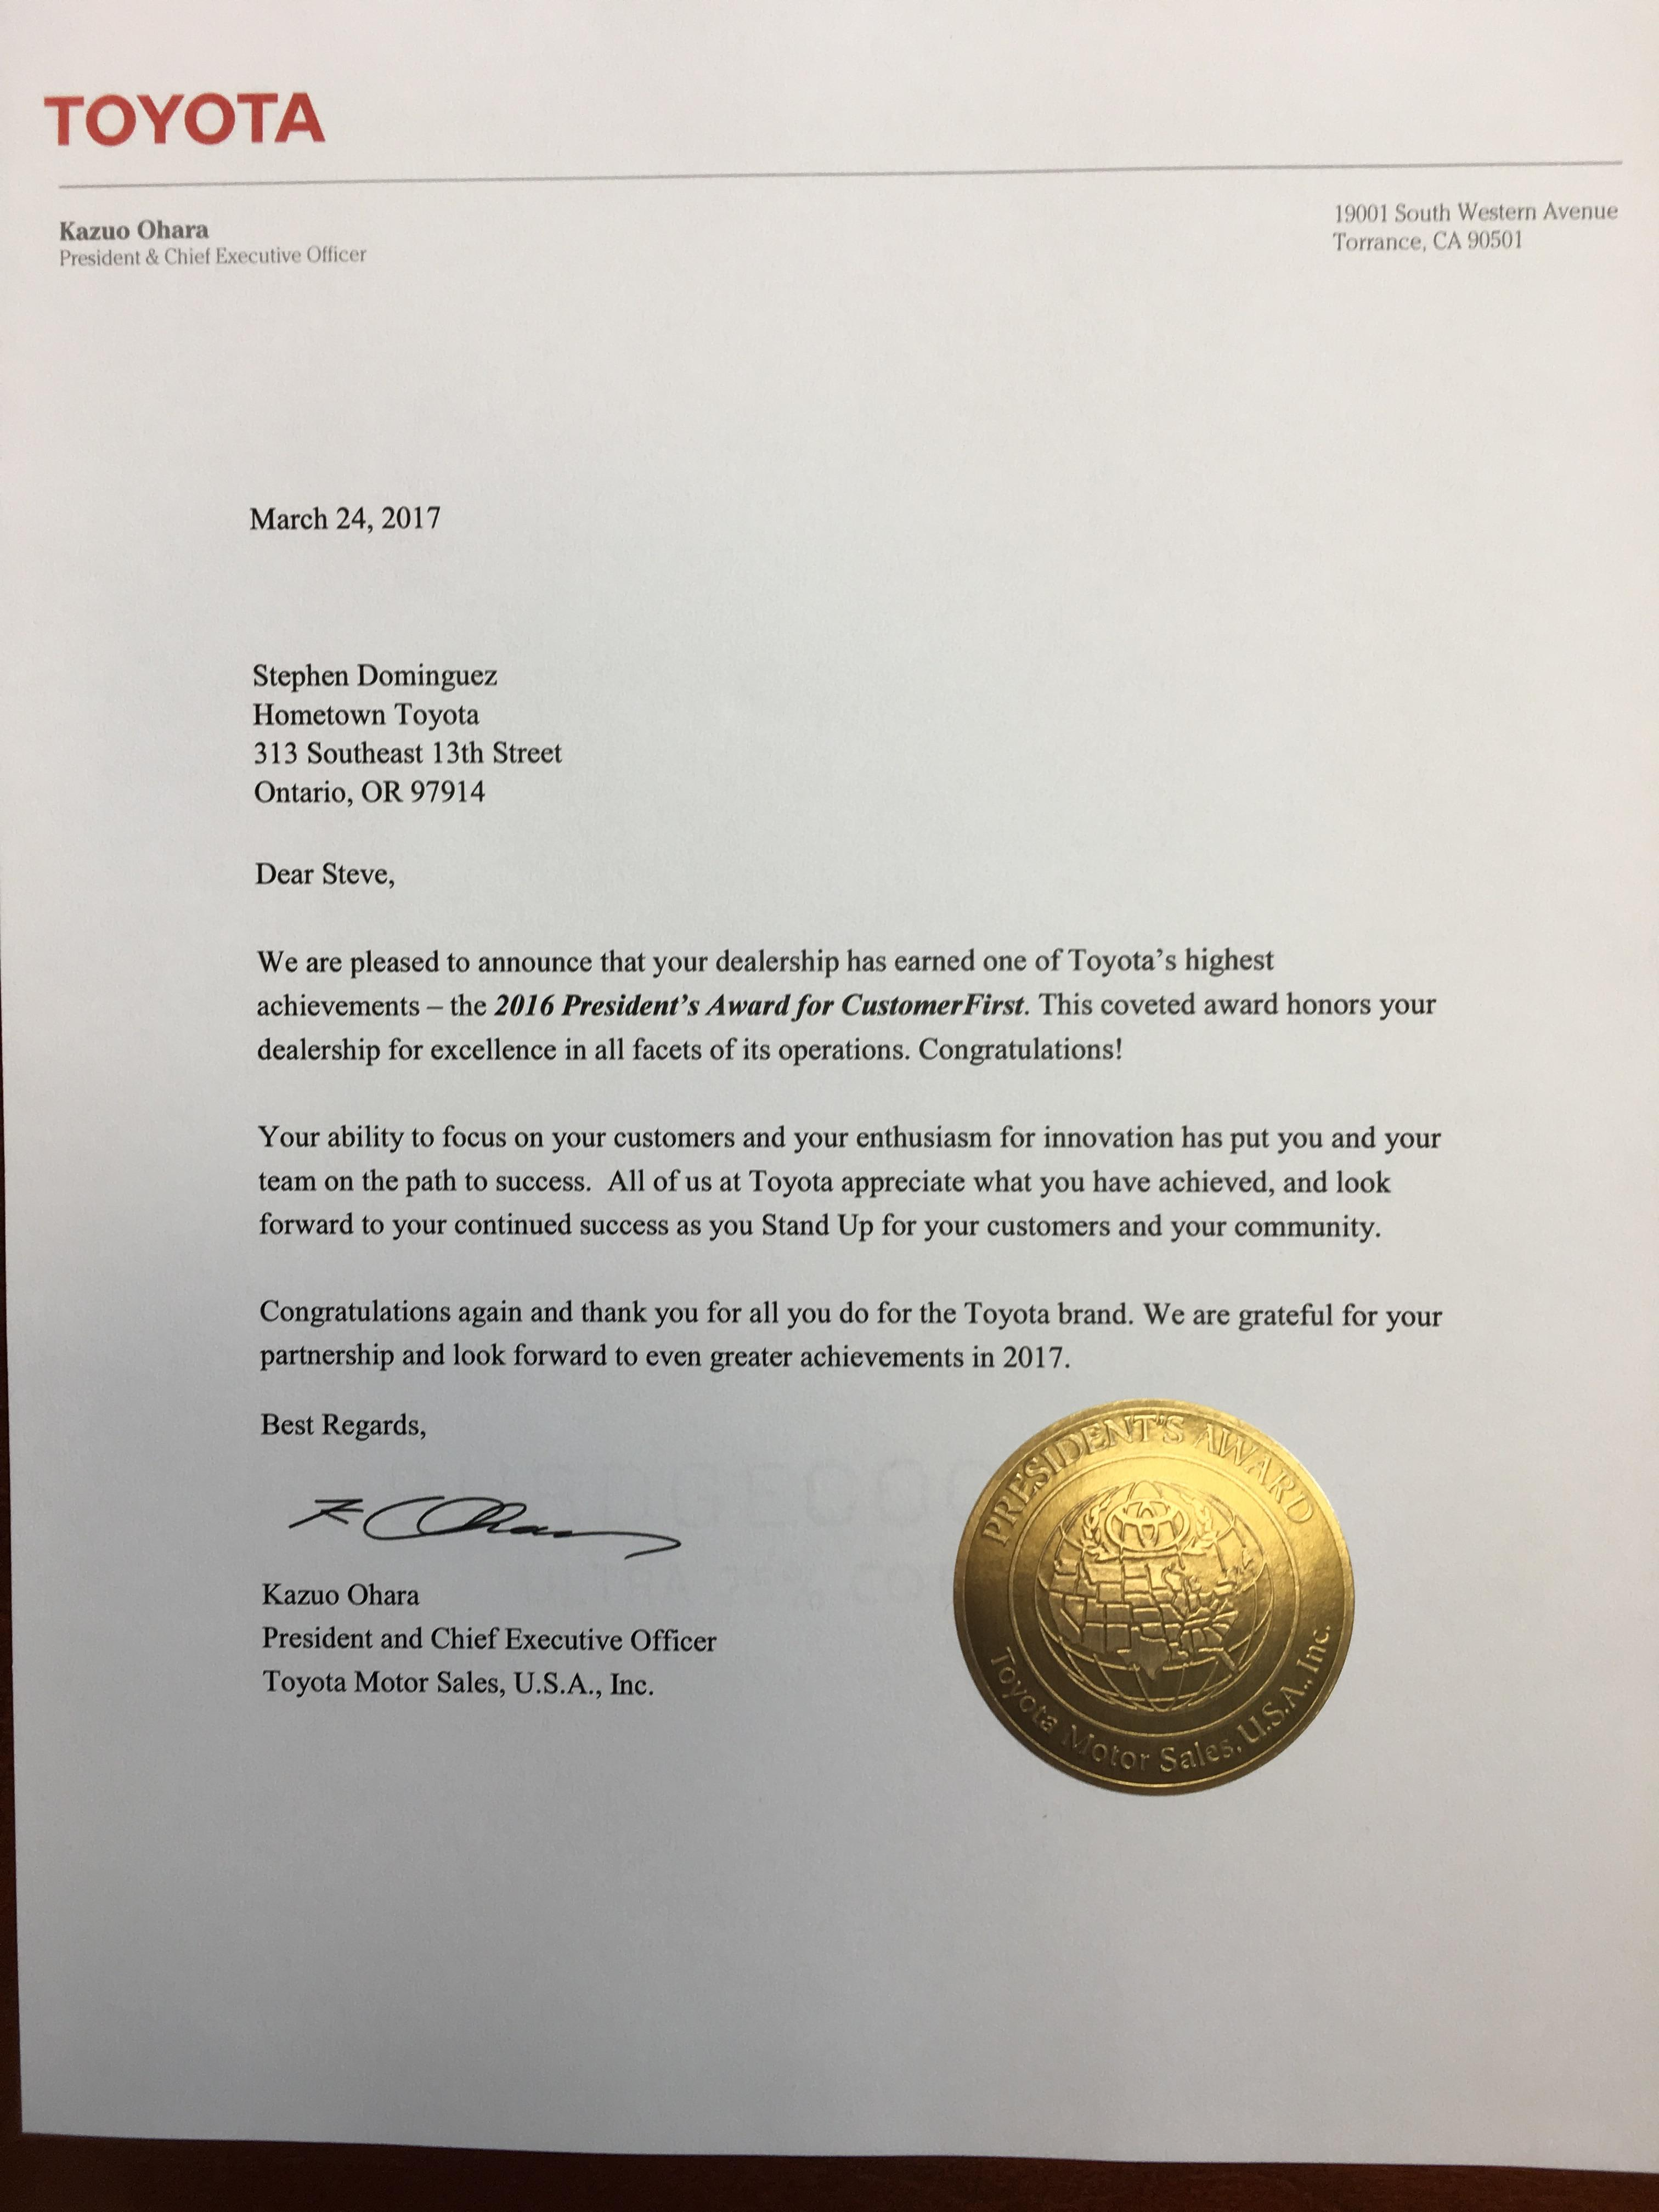 2016 Toyota President's Award